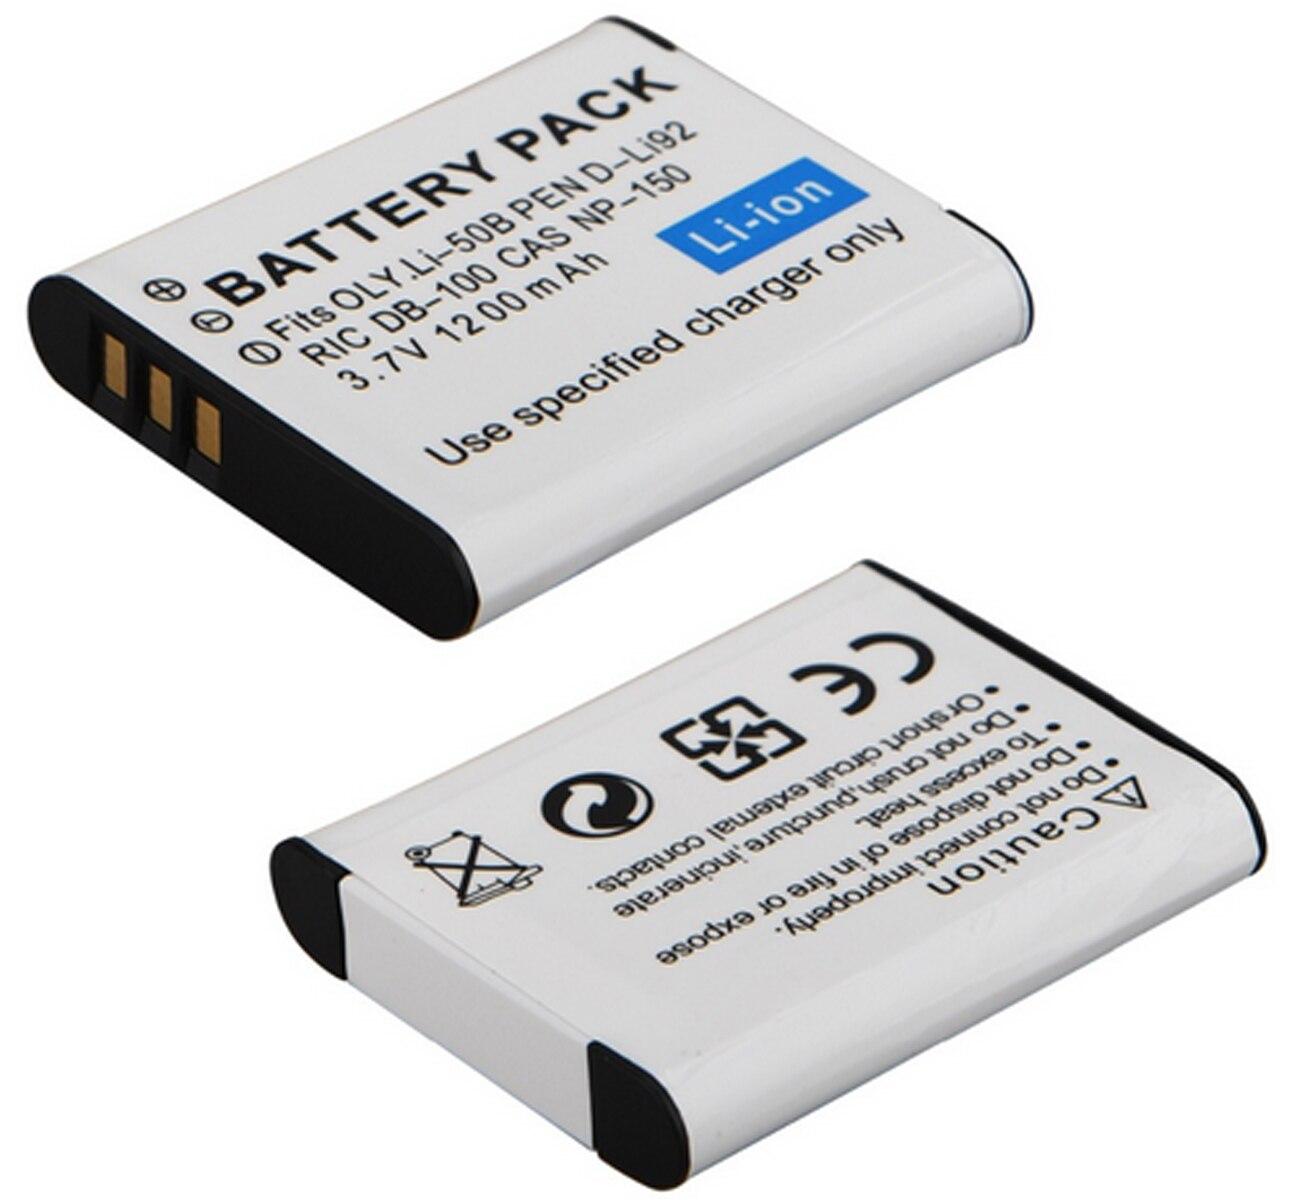 Bateria para la richo wg-30 wg-30w wg30 wg30w